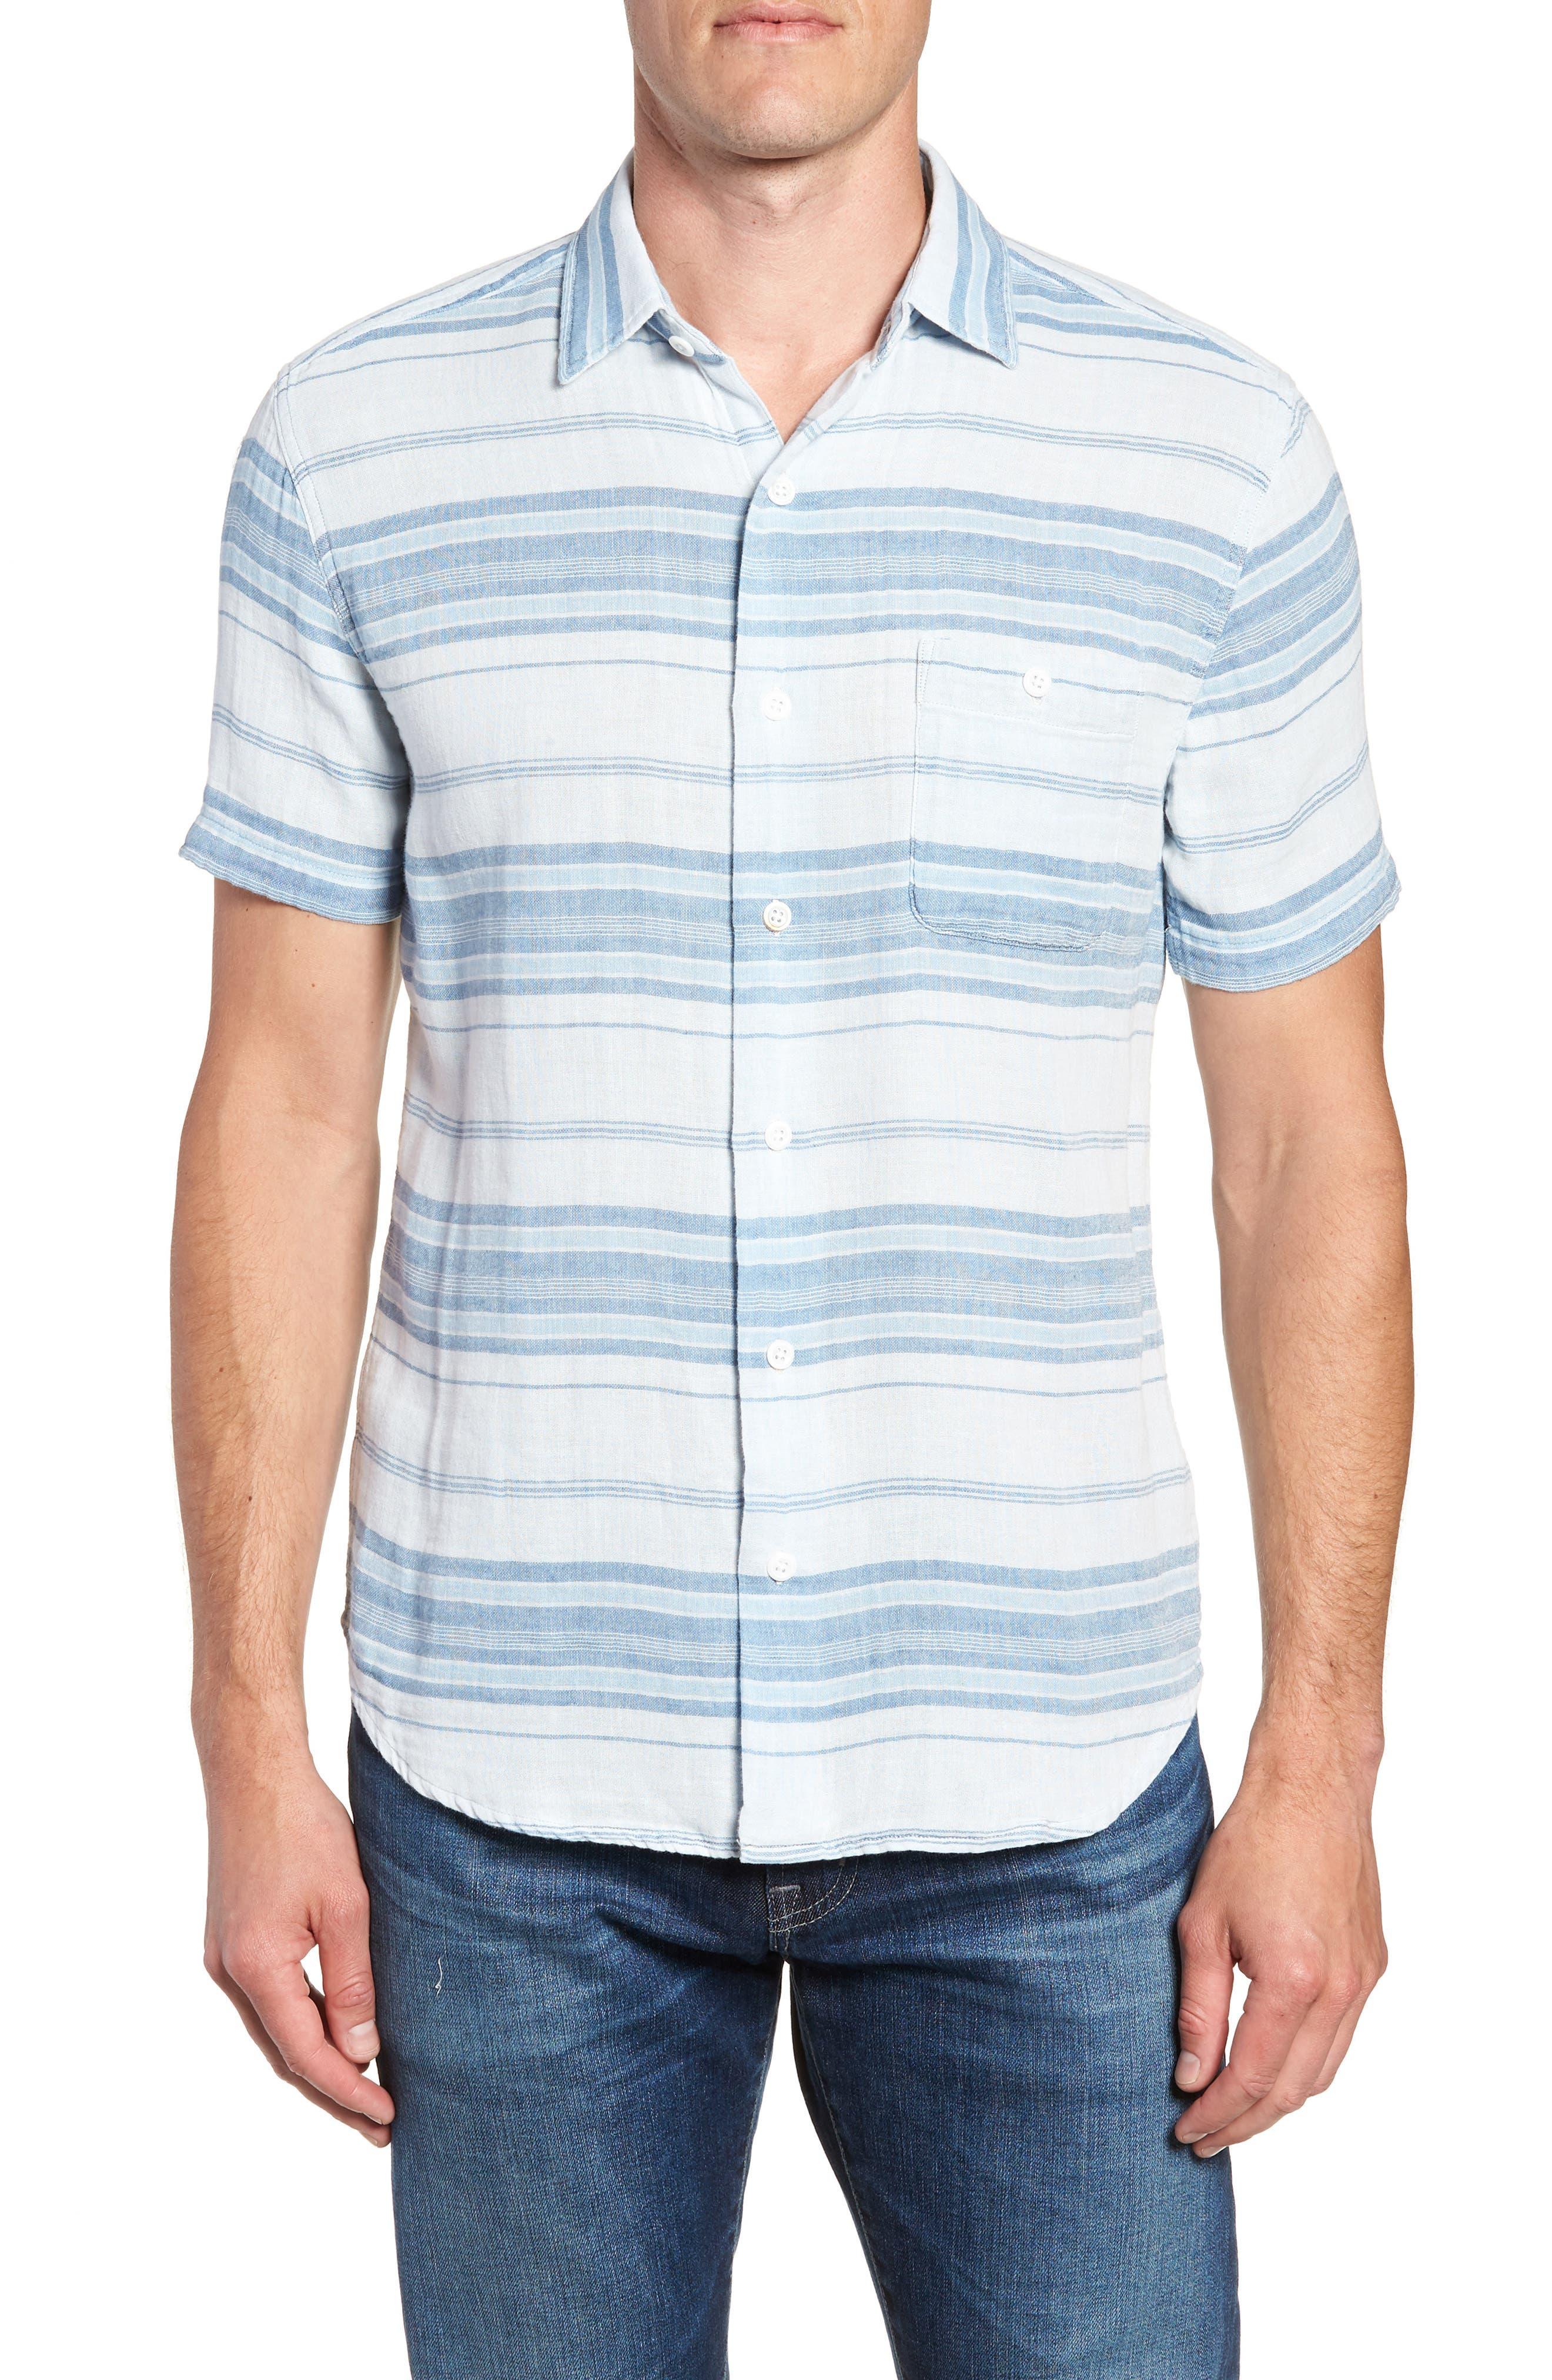 Ventura Double Cloth Short Sleeve Shirt,                         Main,                         color, Light Indigo Serape